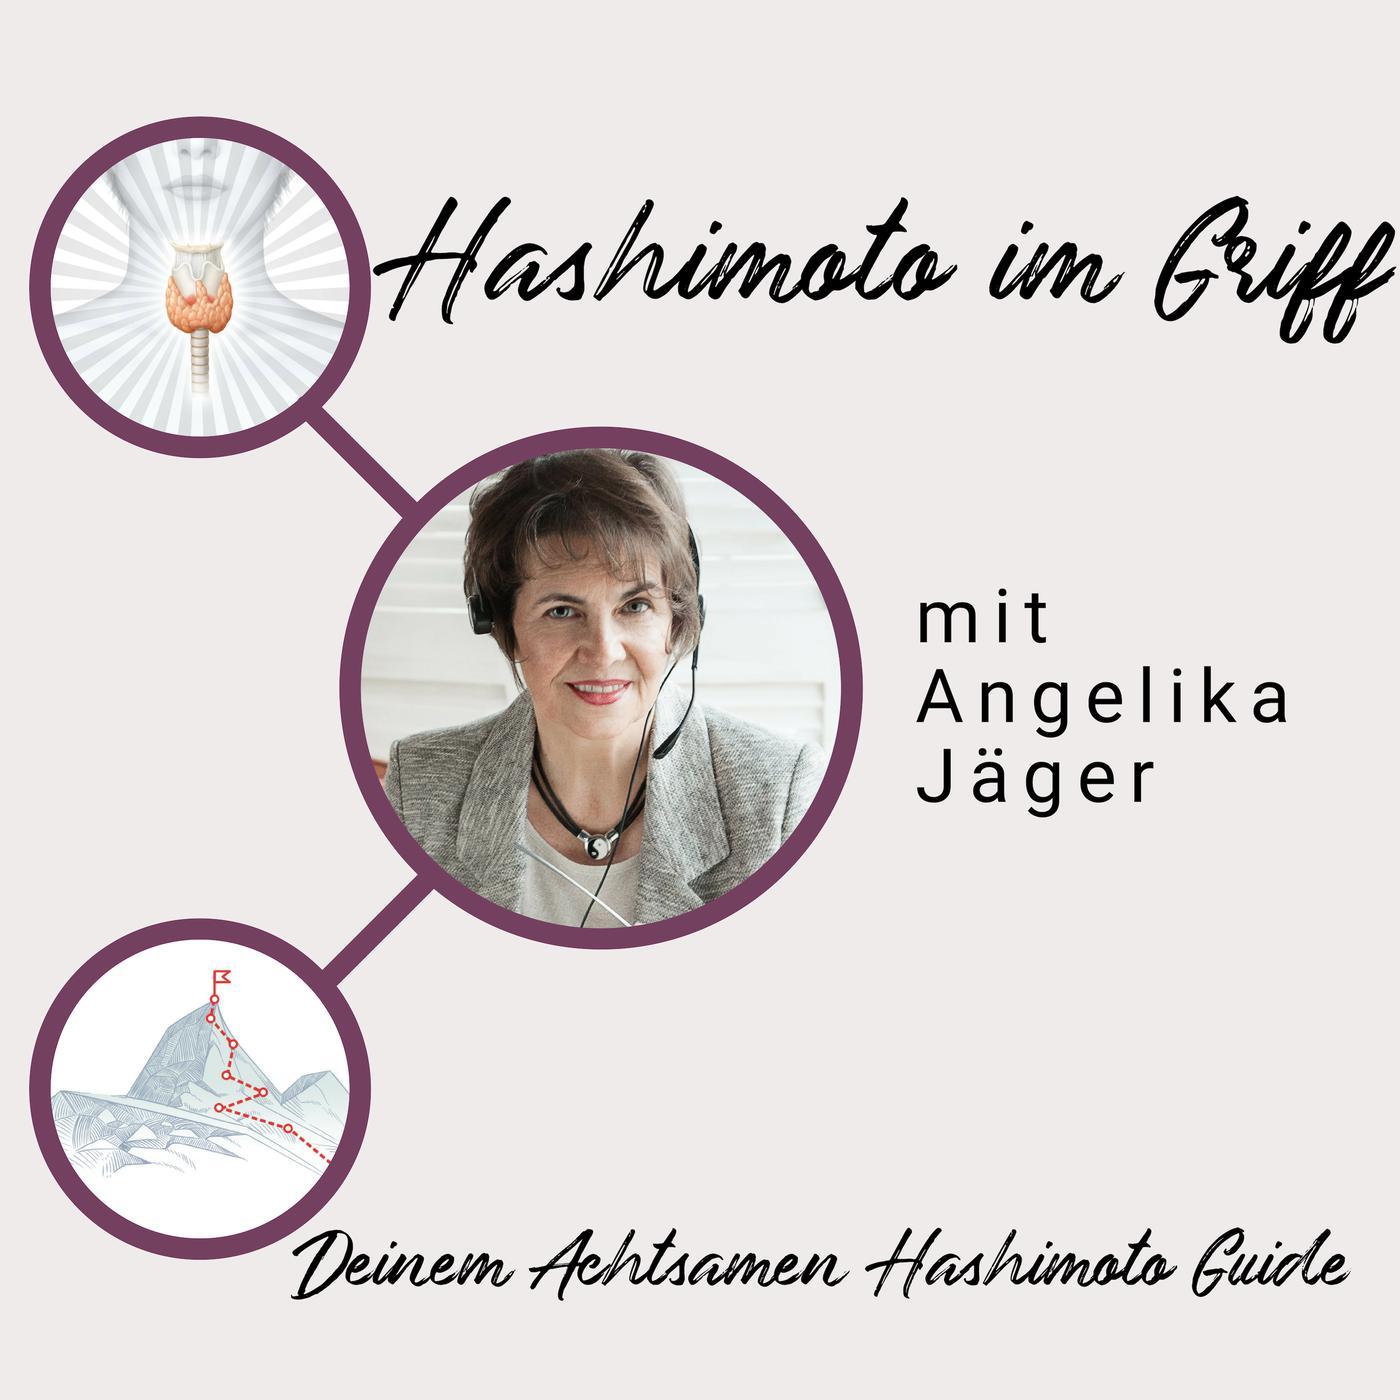 Angelika Jager endlich hashimoto im griff (podcast) - angelika jäger